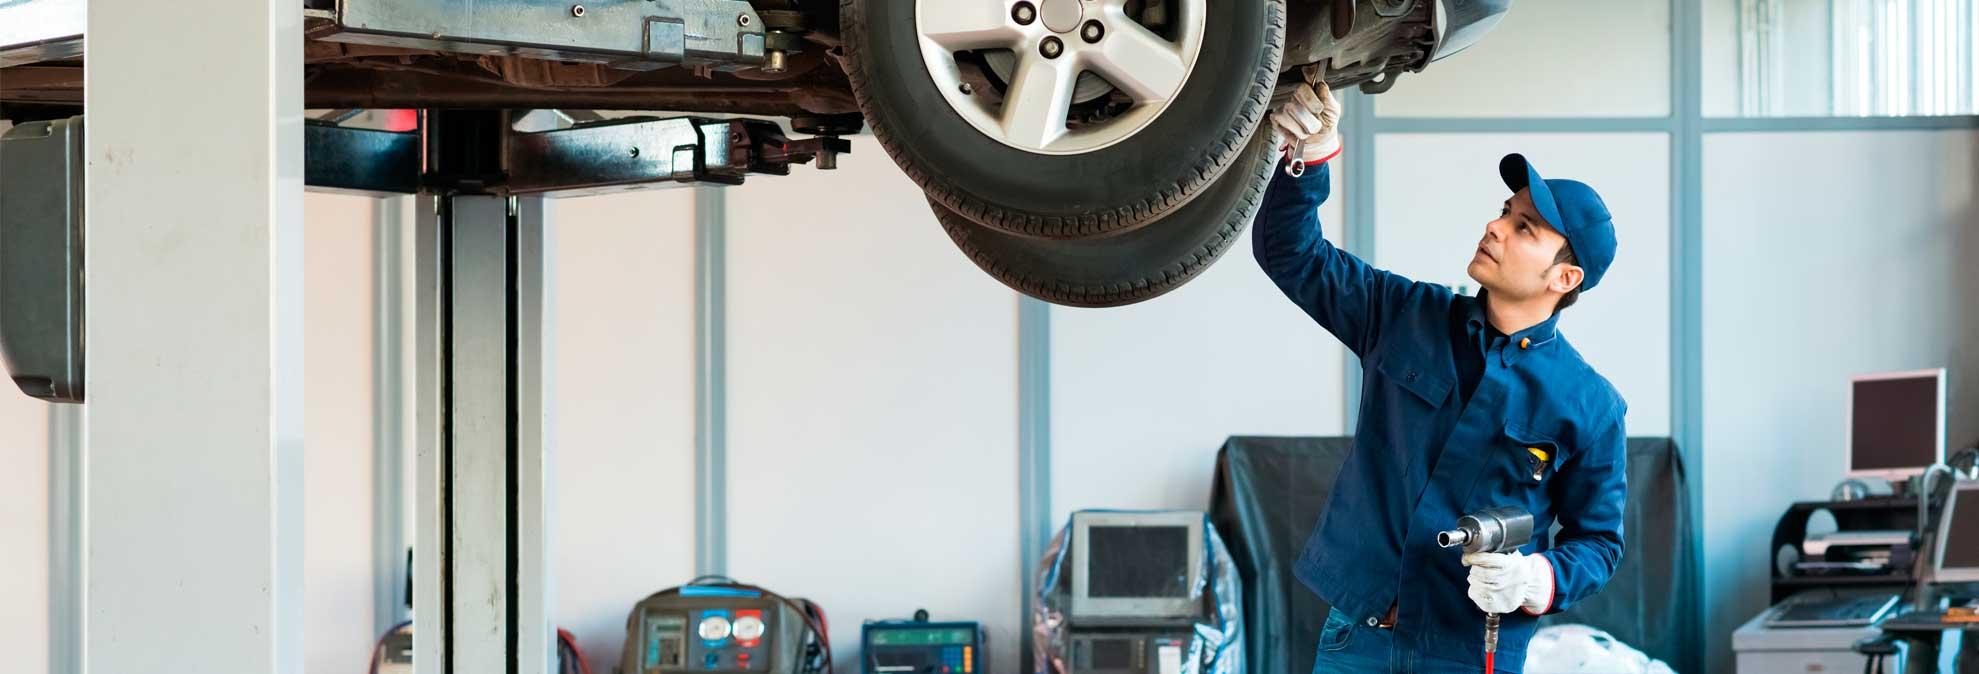 Best Car Repair Shop Buying Guide Consumer Reports